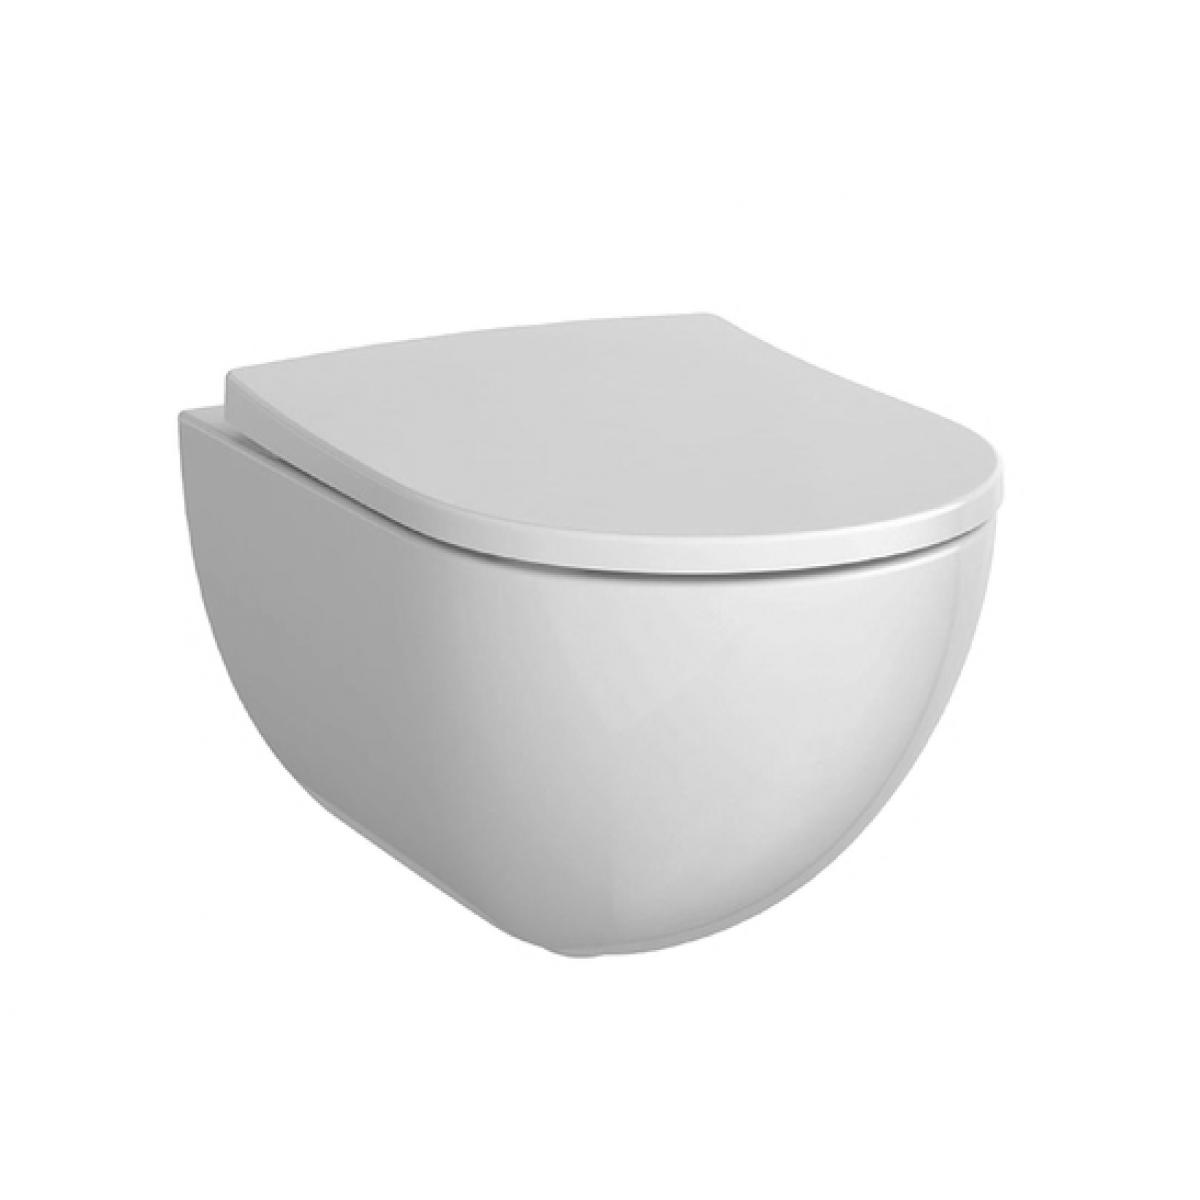 Geberit Acanto Wall Hung Rimfree Washdown Toilet Uk